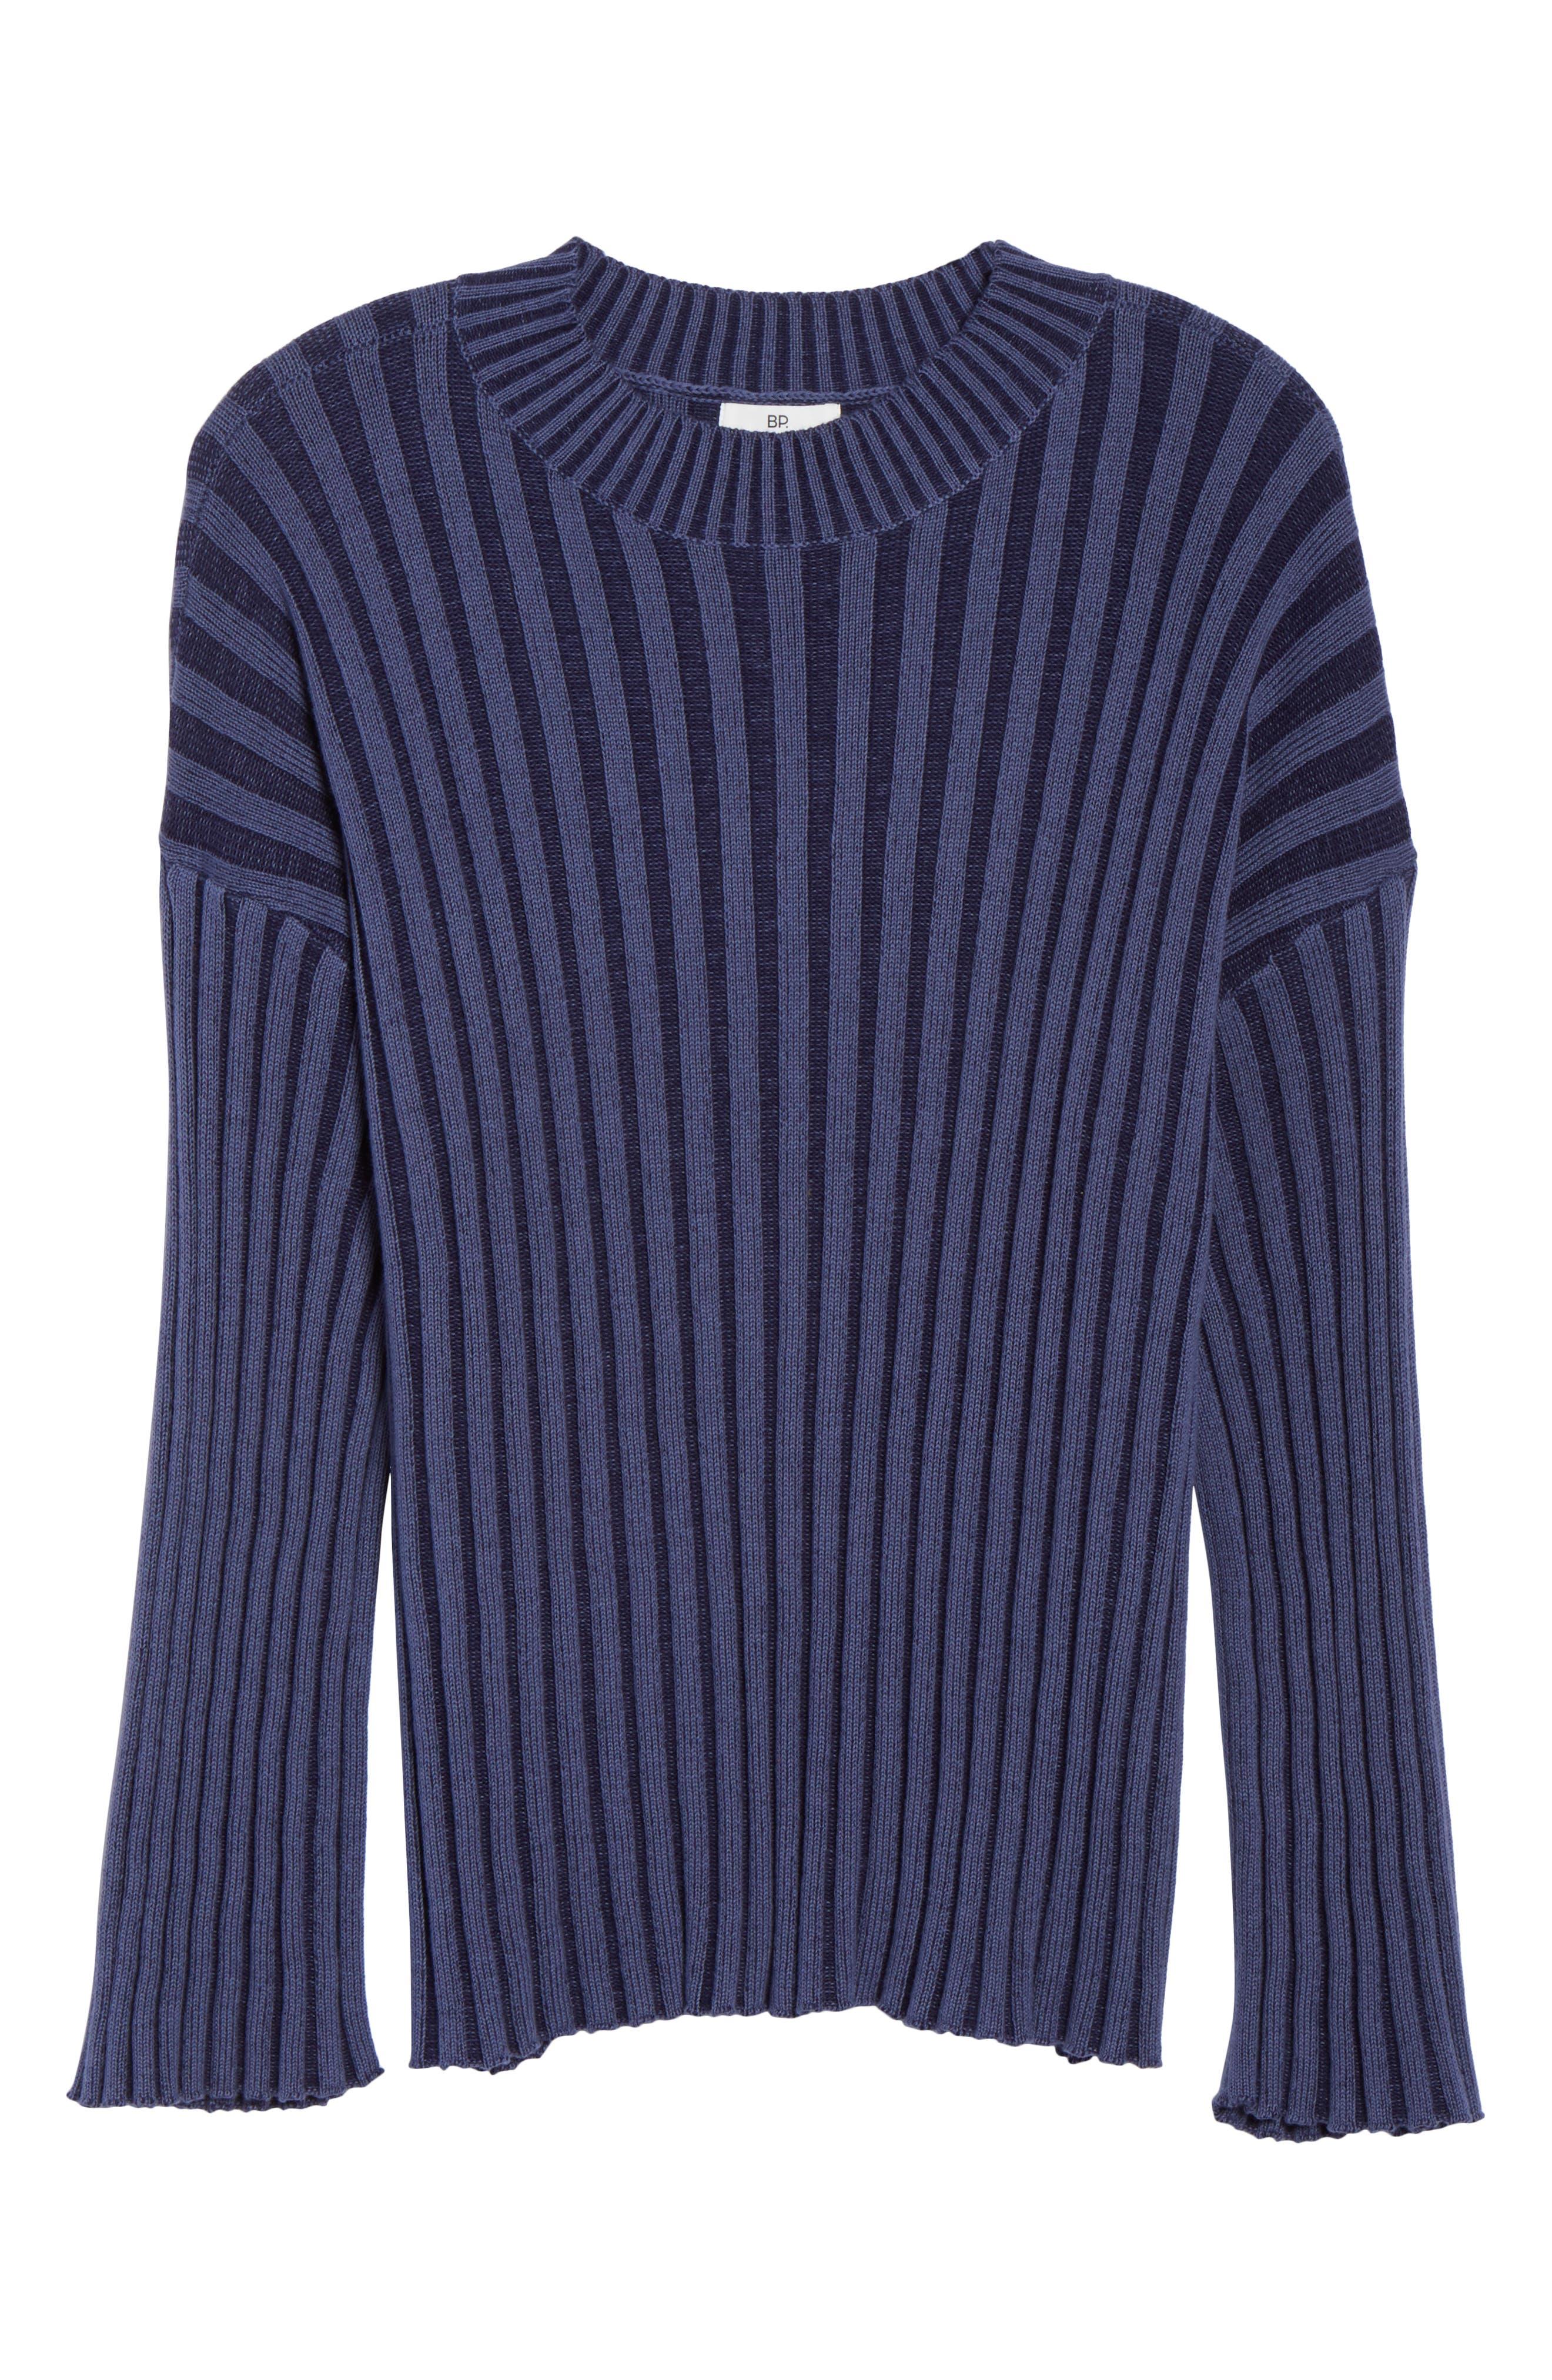 Shadow Rib Crop Sweater,                             Alternate thumbnail 12, color,                             NAVY EVENING